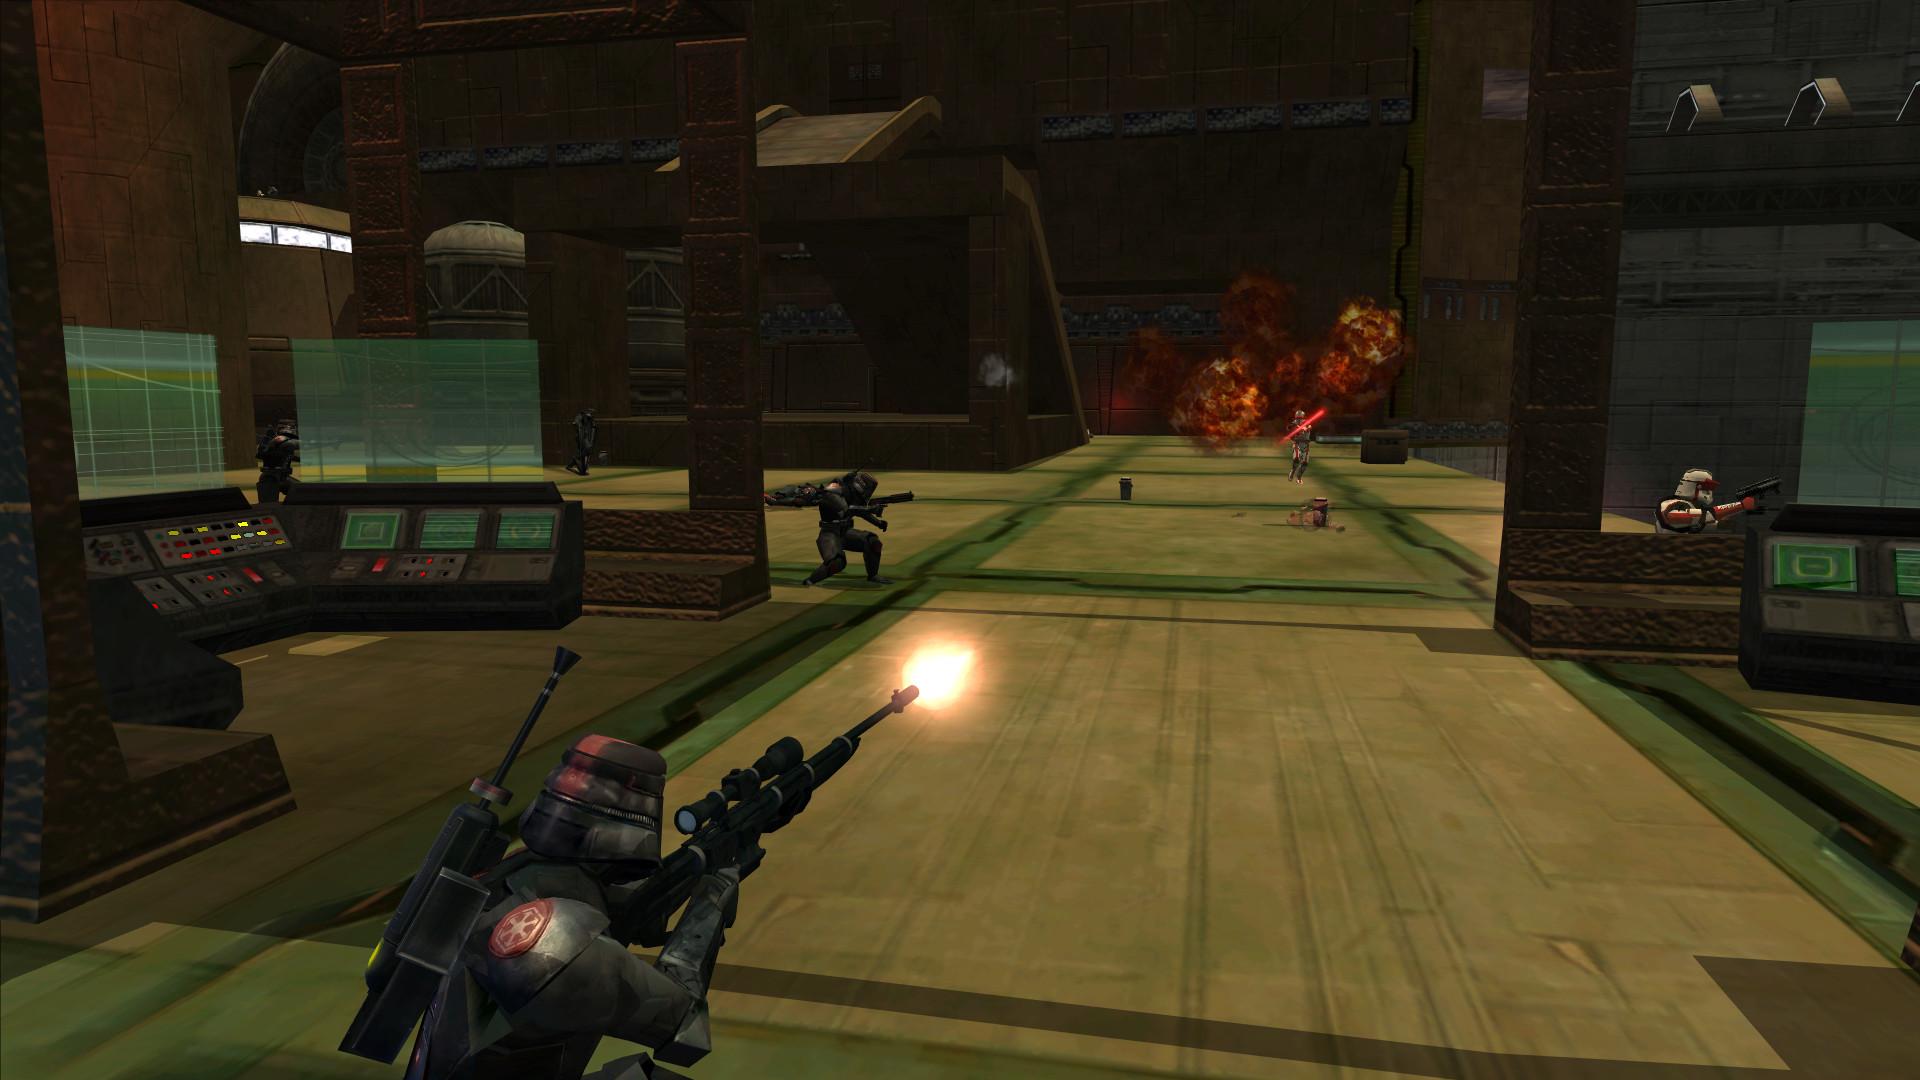 A Sniper takes a shot